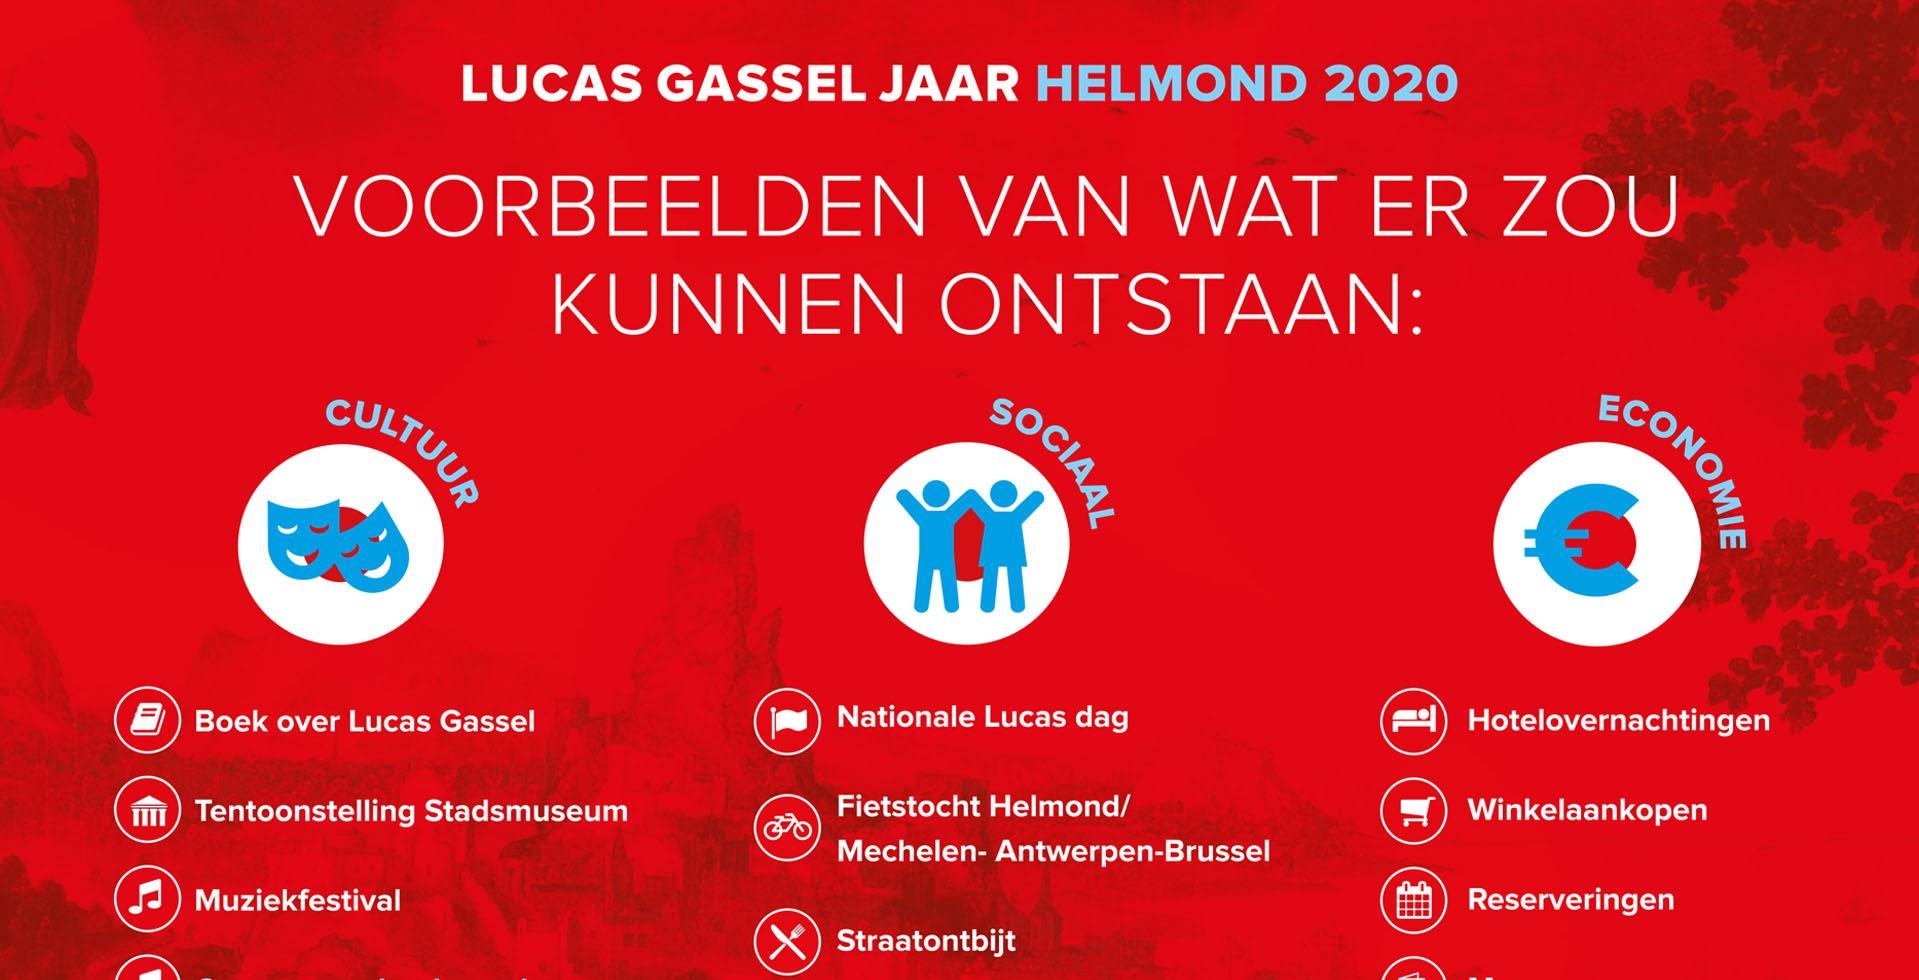 Lucas Gassel infographic slide 2